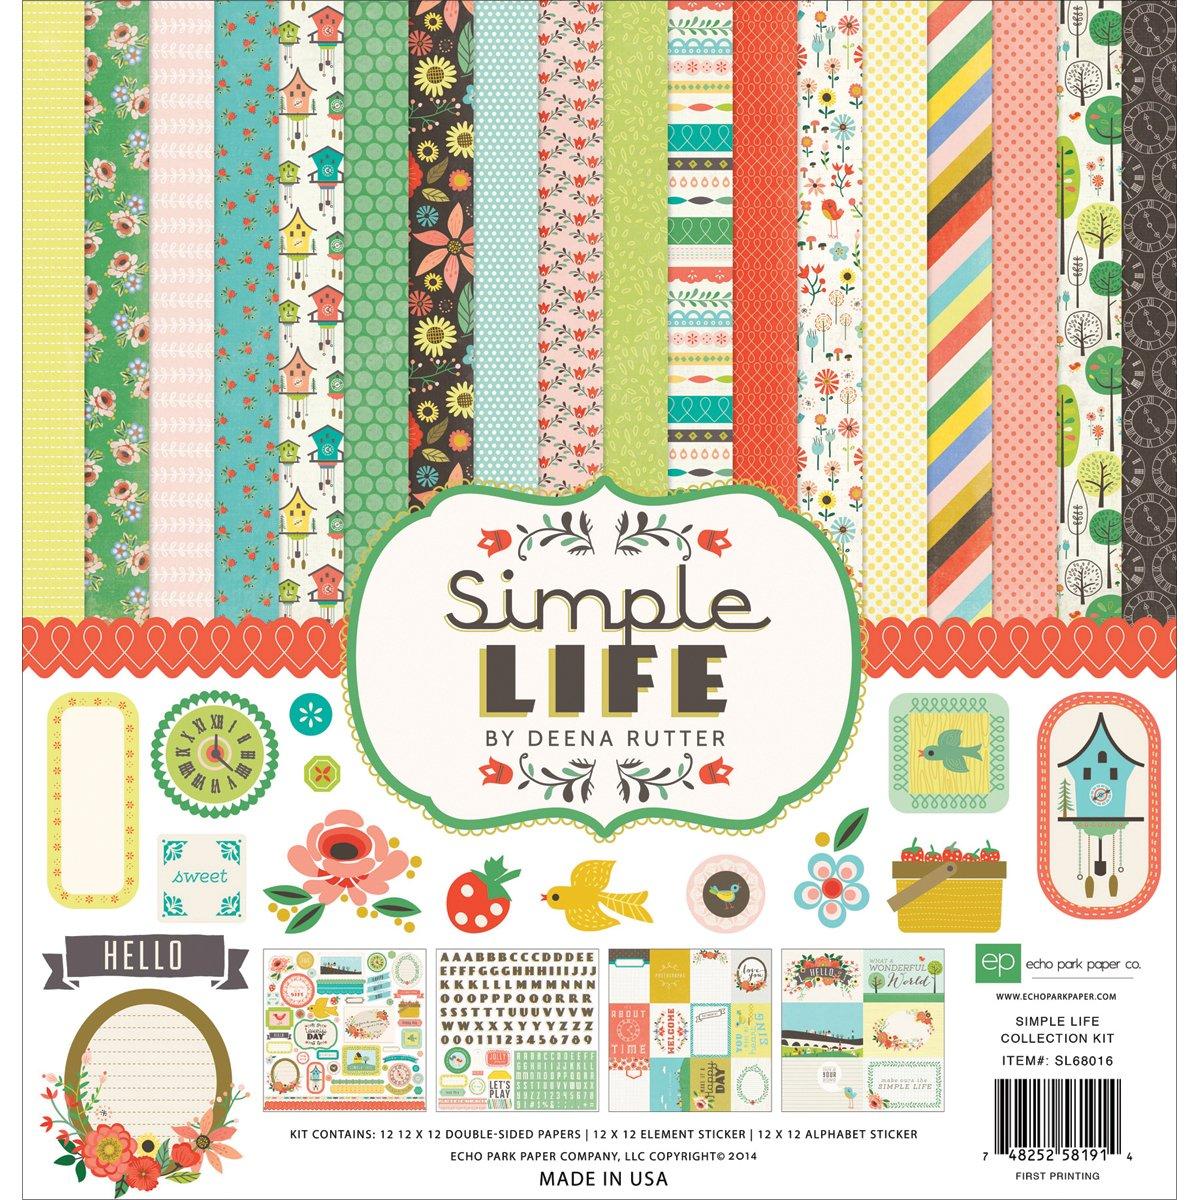 Echo Park Paper Company Simple Life Collection Scrapbooking Kits by Echo Park Paper B00KQKJIWA